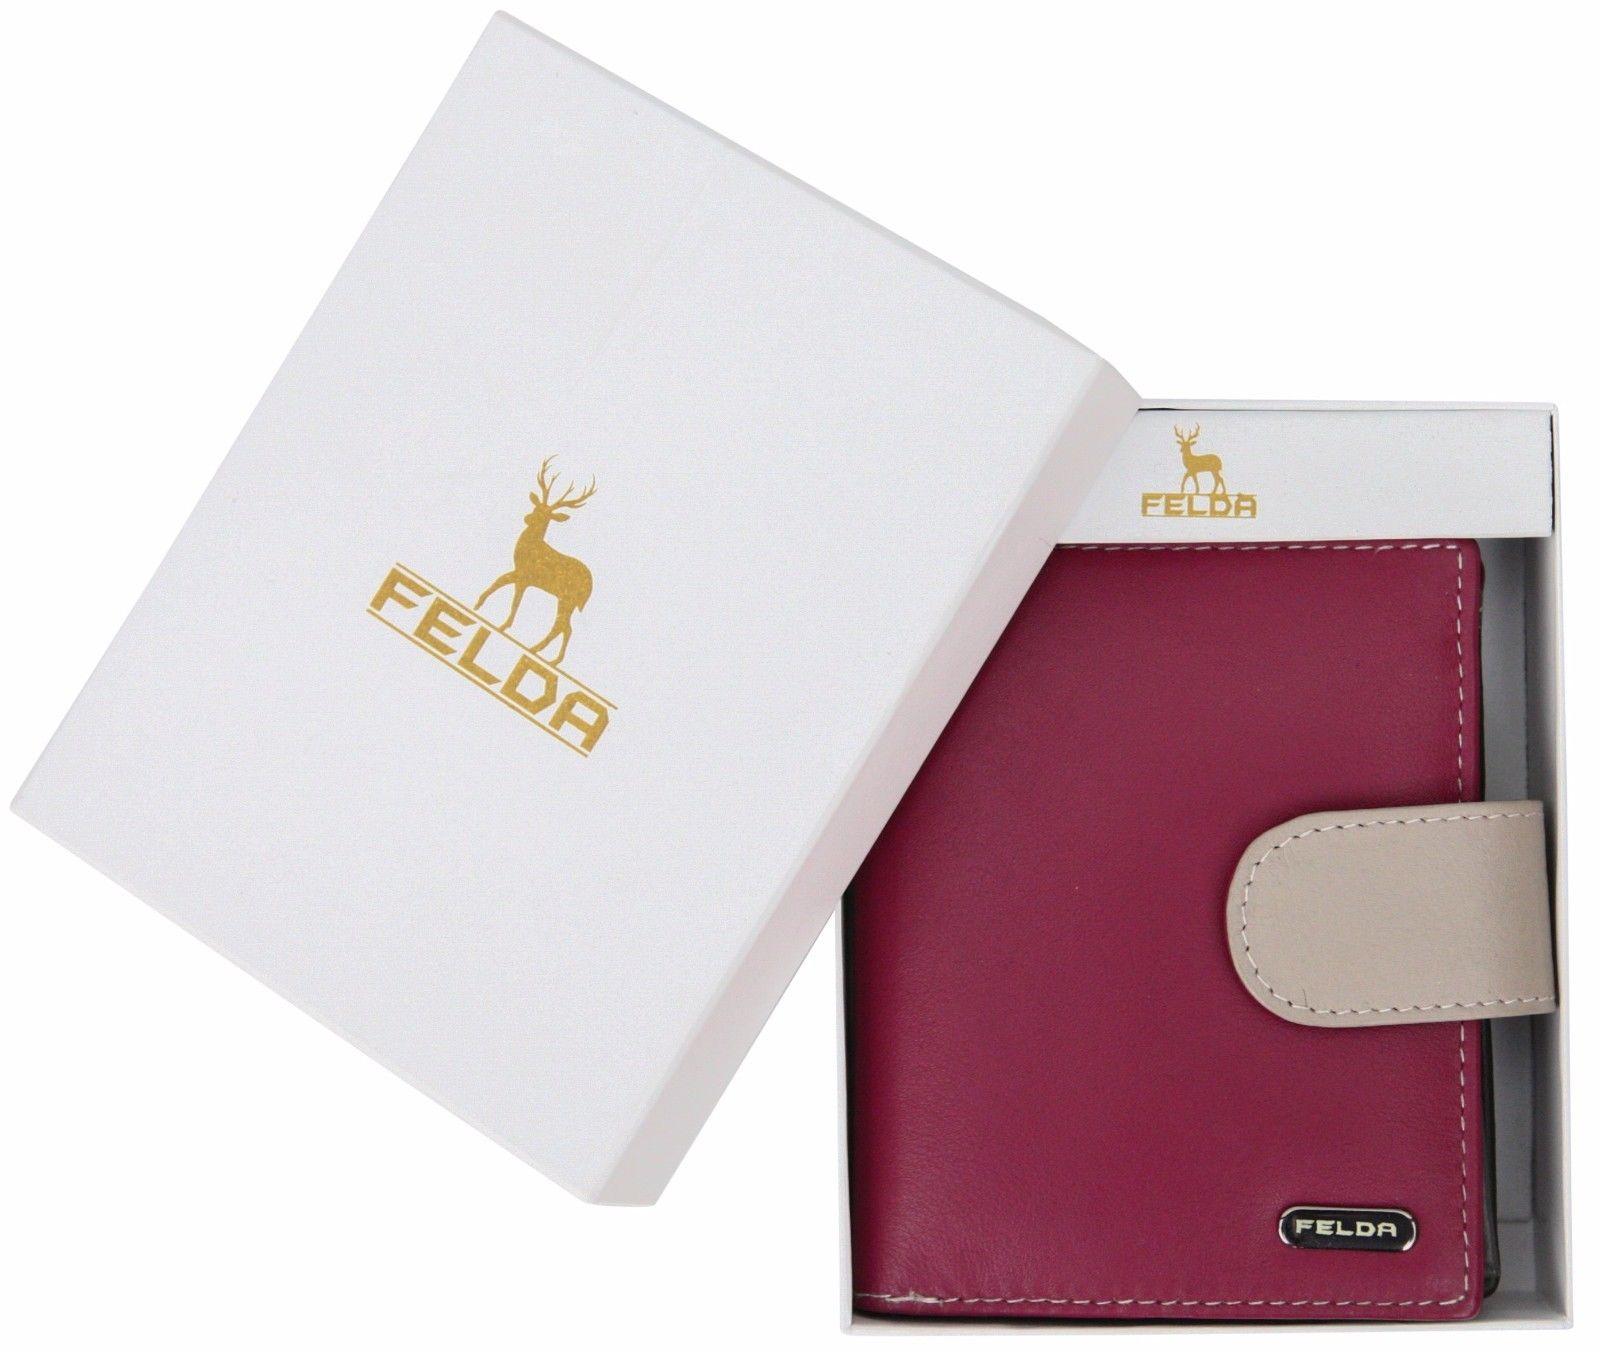 Felda-RFID-onorevoli-MEDAGLIA-amp-Card-Purse-Wallet-Genuine-Leather-Multi-SOFT-BOX-REGALO miniatura 43